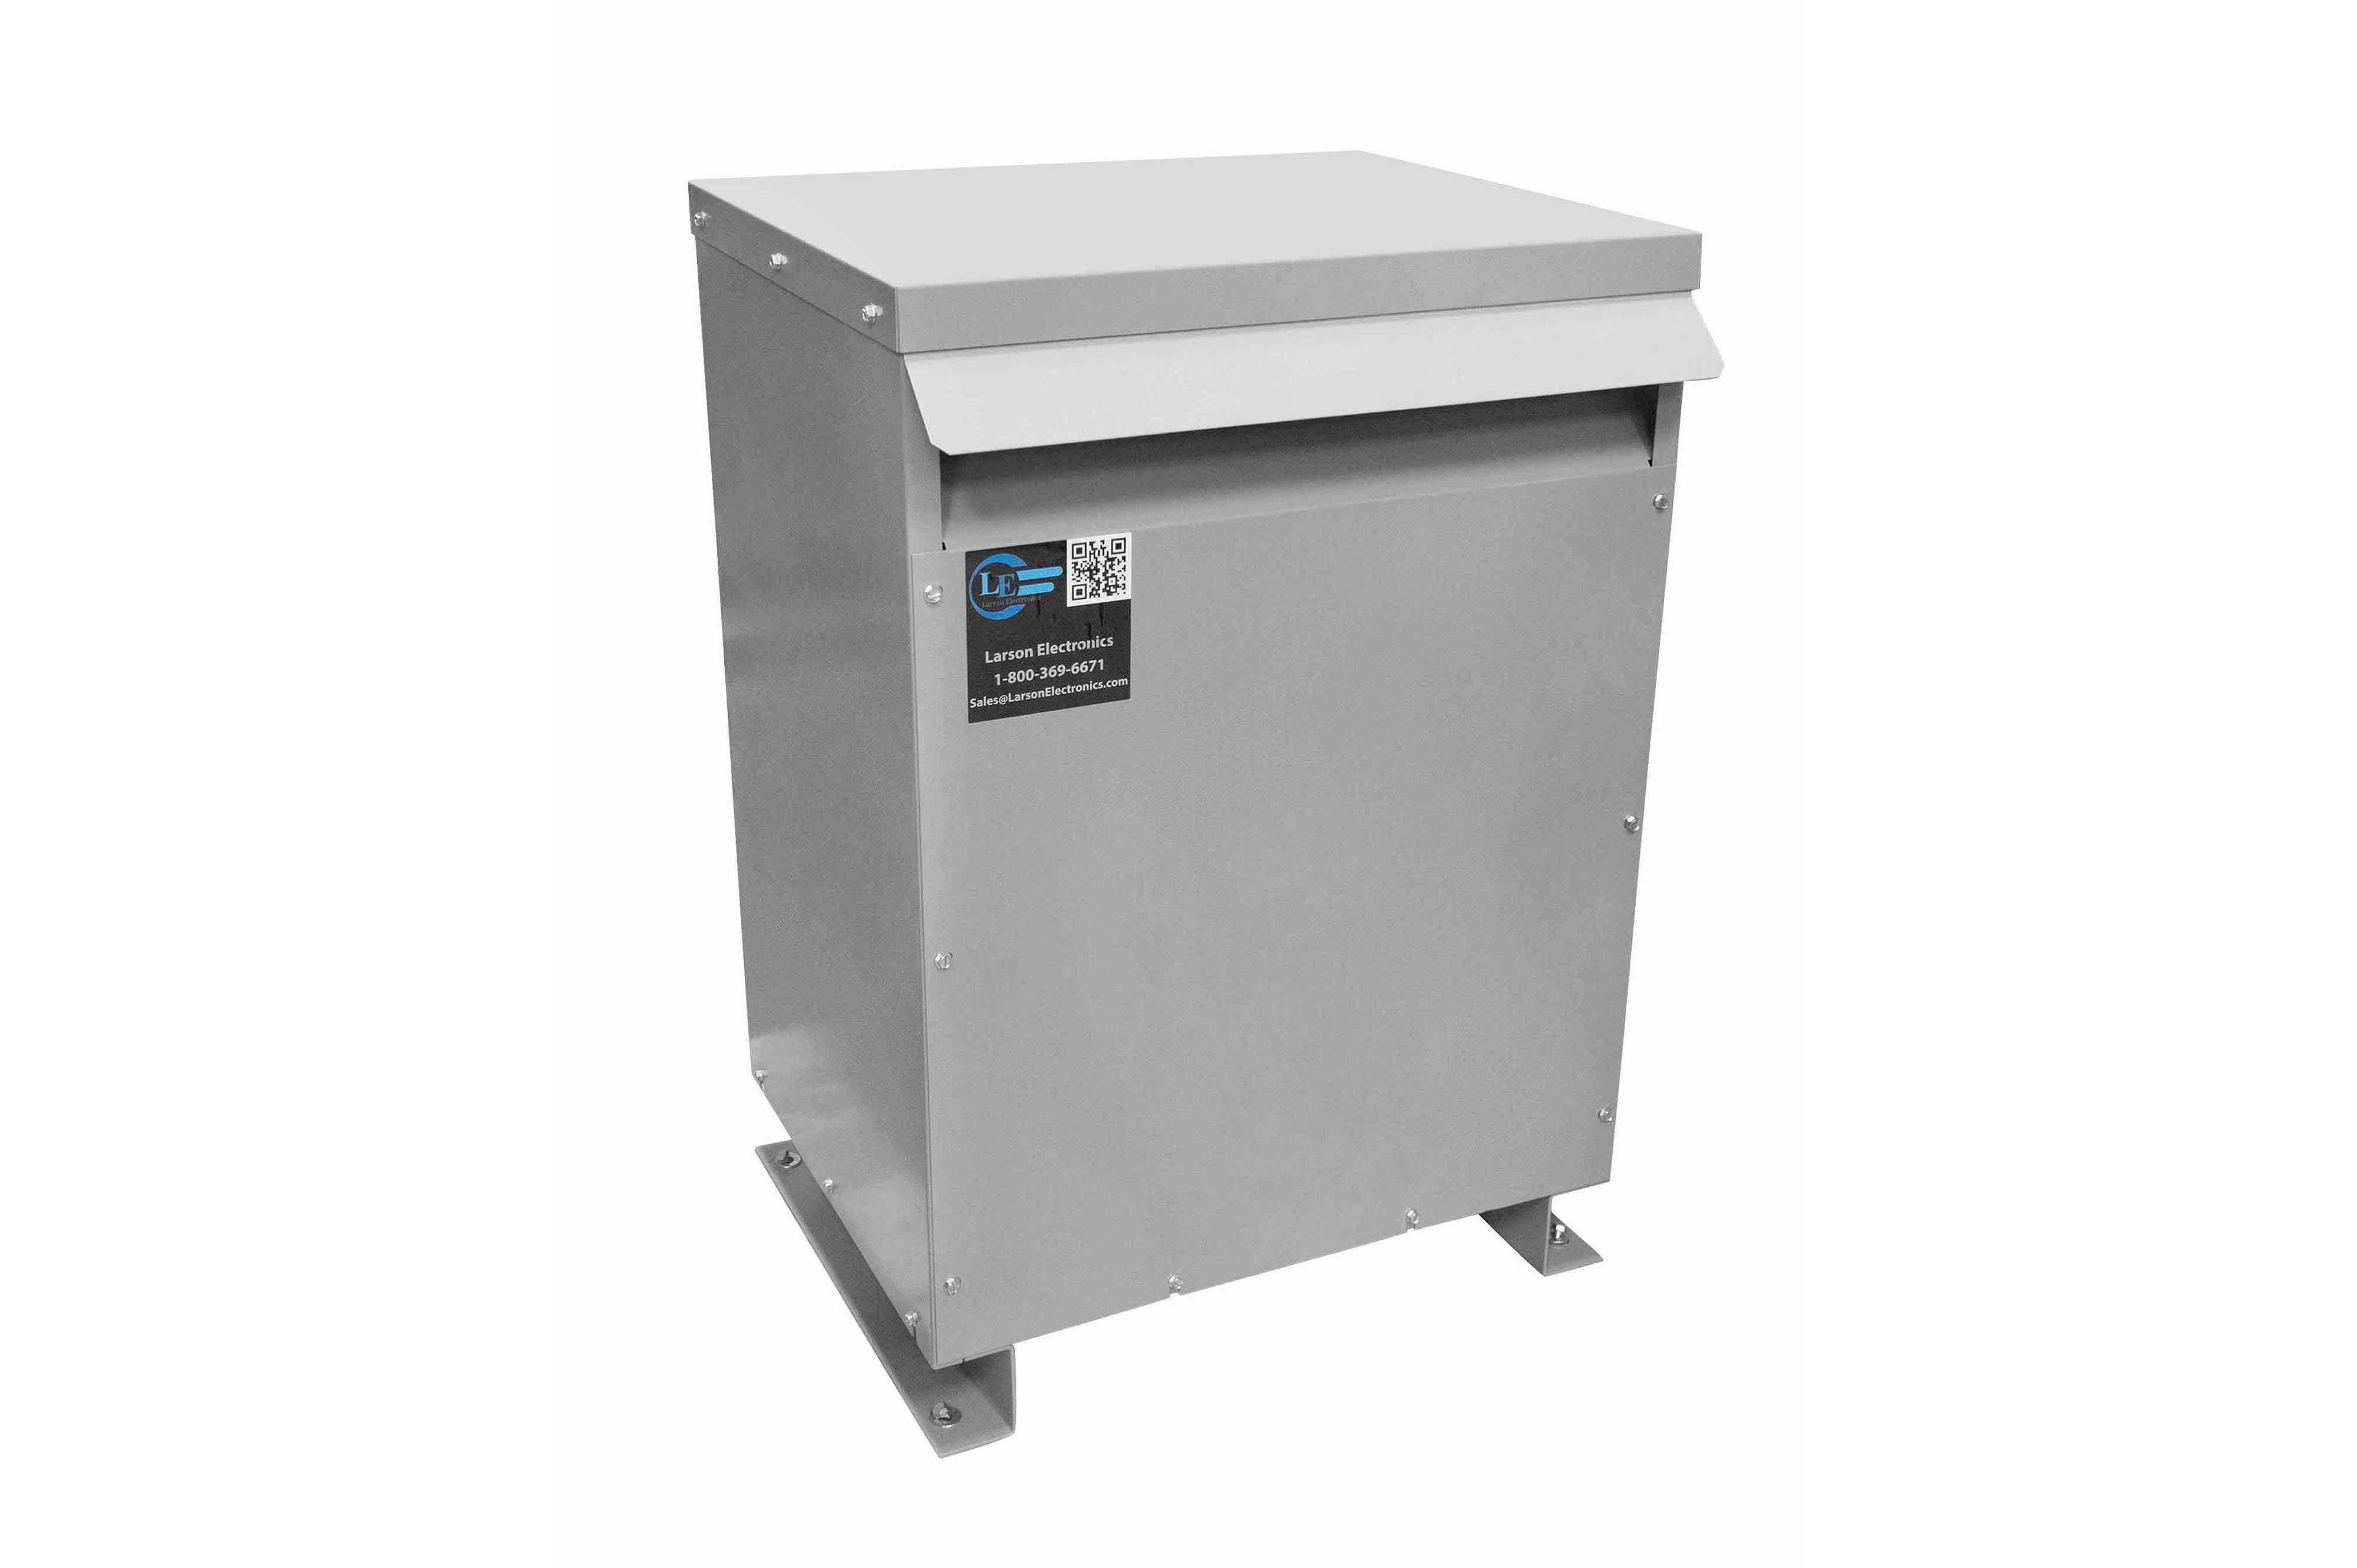 20 kVA 3PH DOE Transformer, 230V Delta Primary, 208Y/120 Wye-N Secondary, N3R, Ventilated, 60 Hz